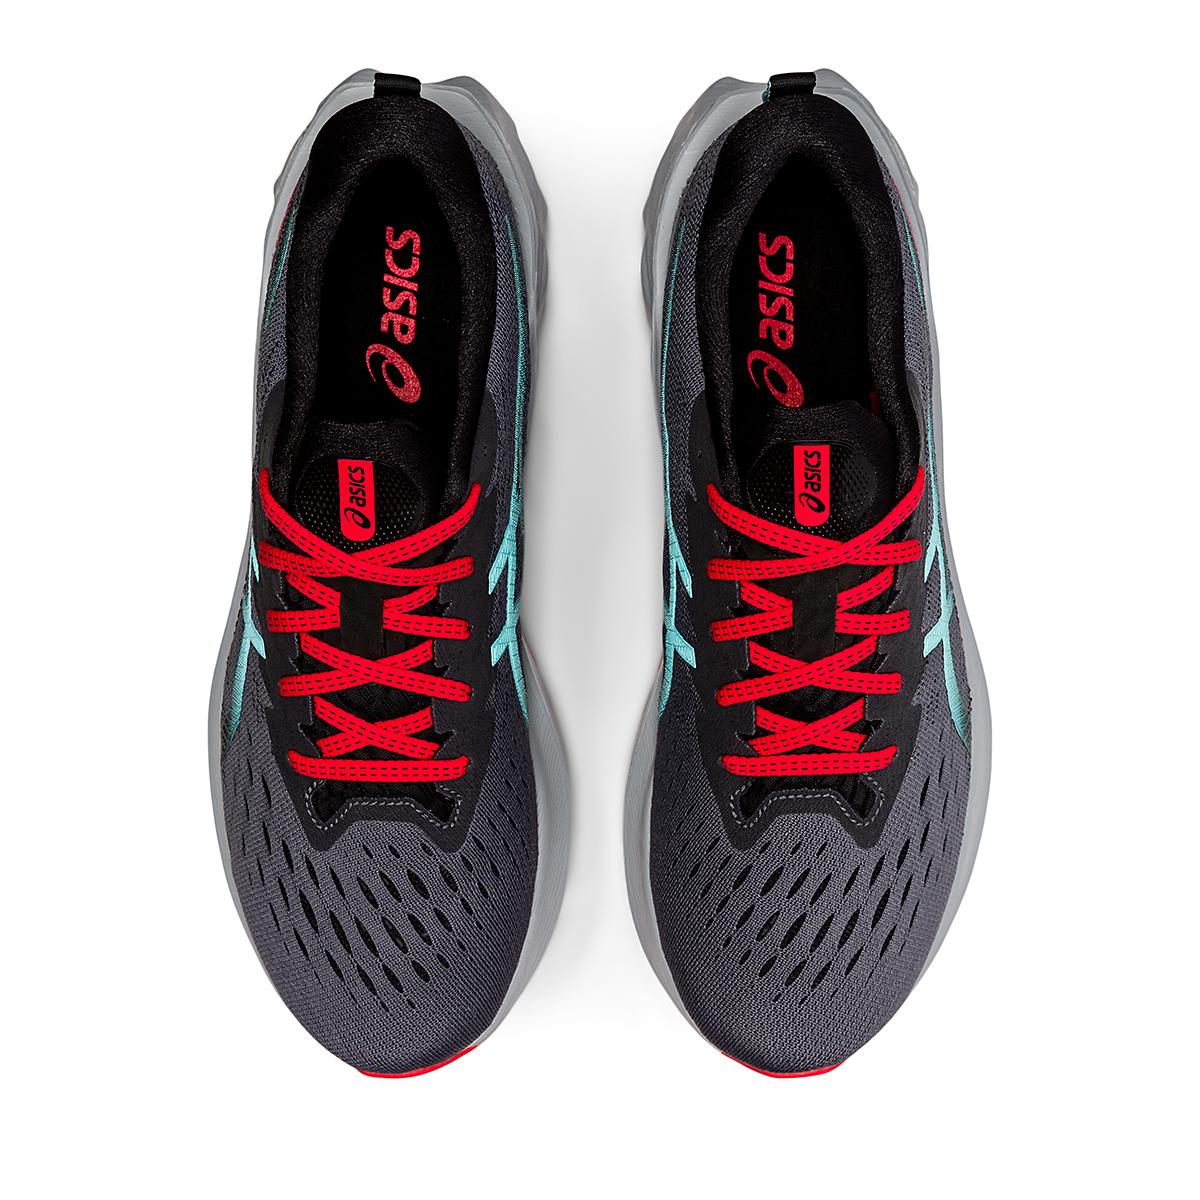 Men's Asics Novablast 2 Running Shoe - Color: Metropolis/Clear Blue - Size: 6 - Width: Regular, Metropolis/Clear Blue, large, image 5